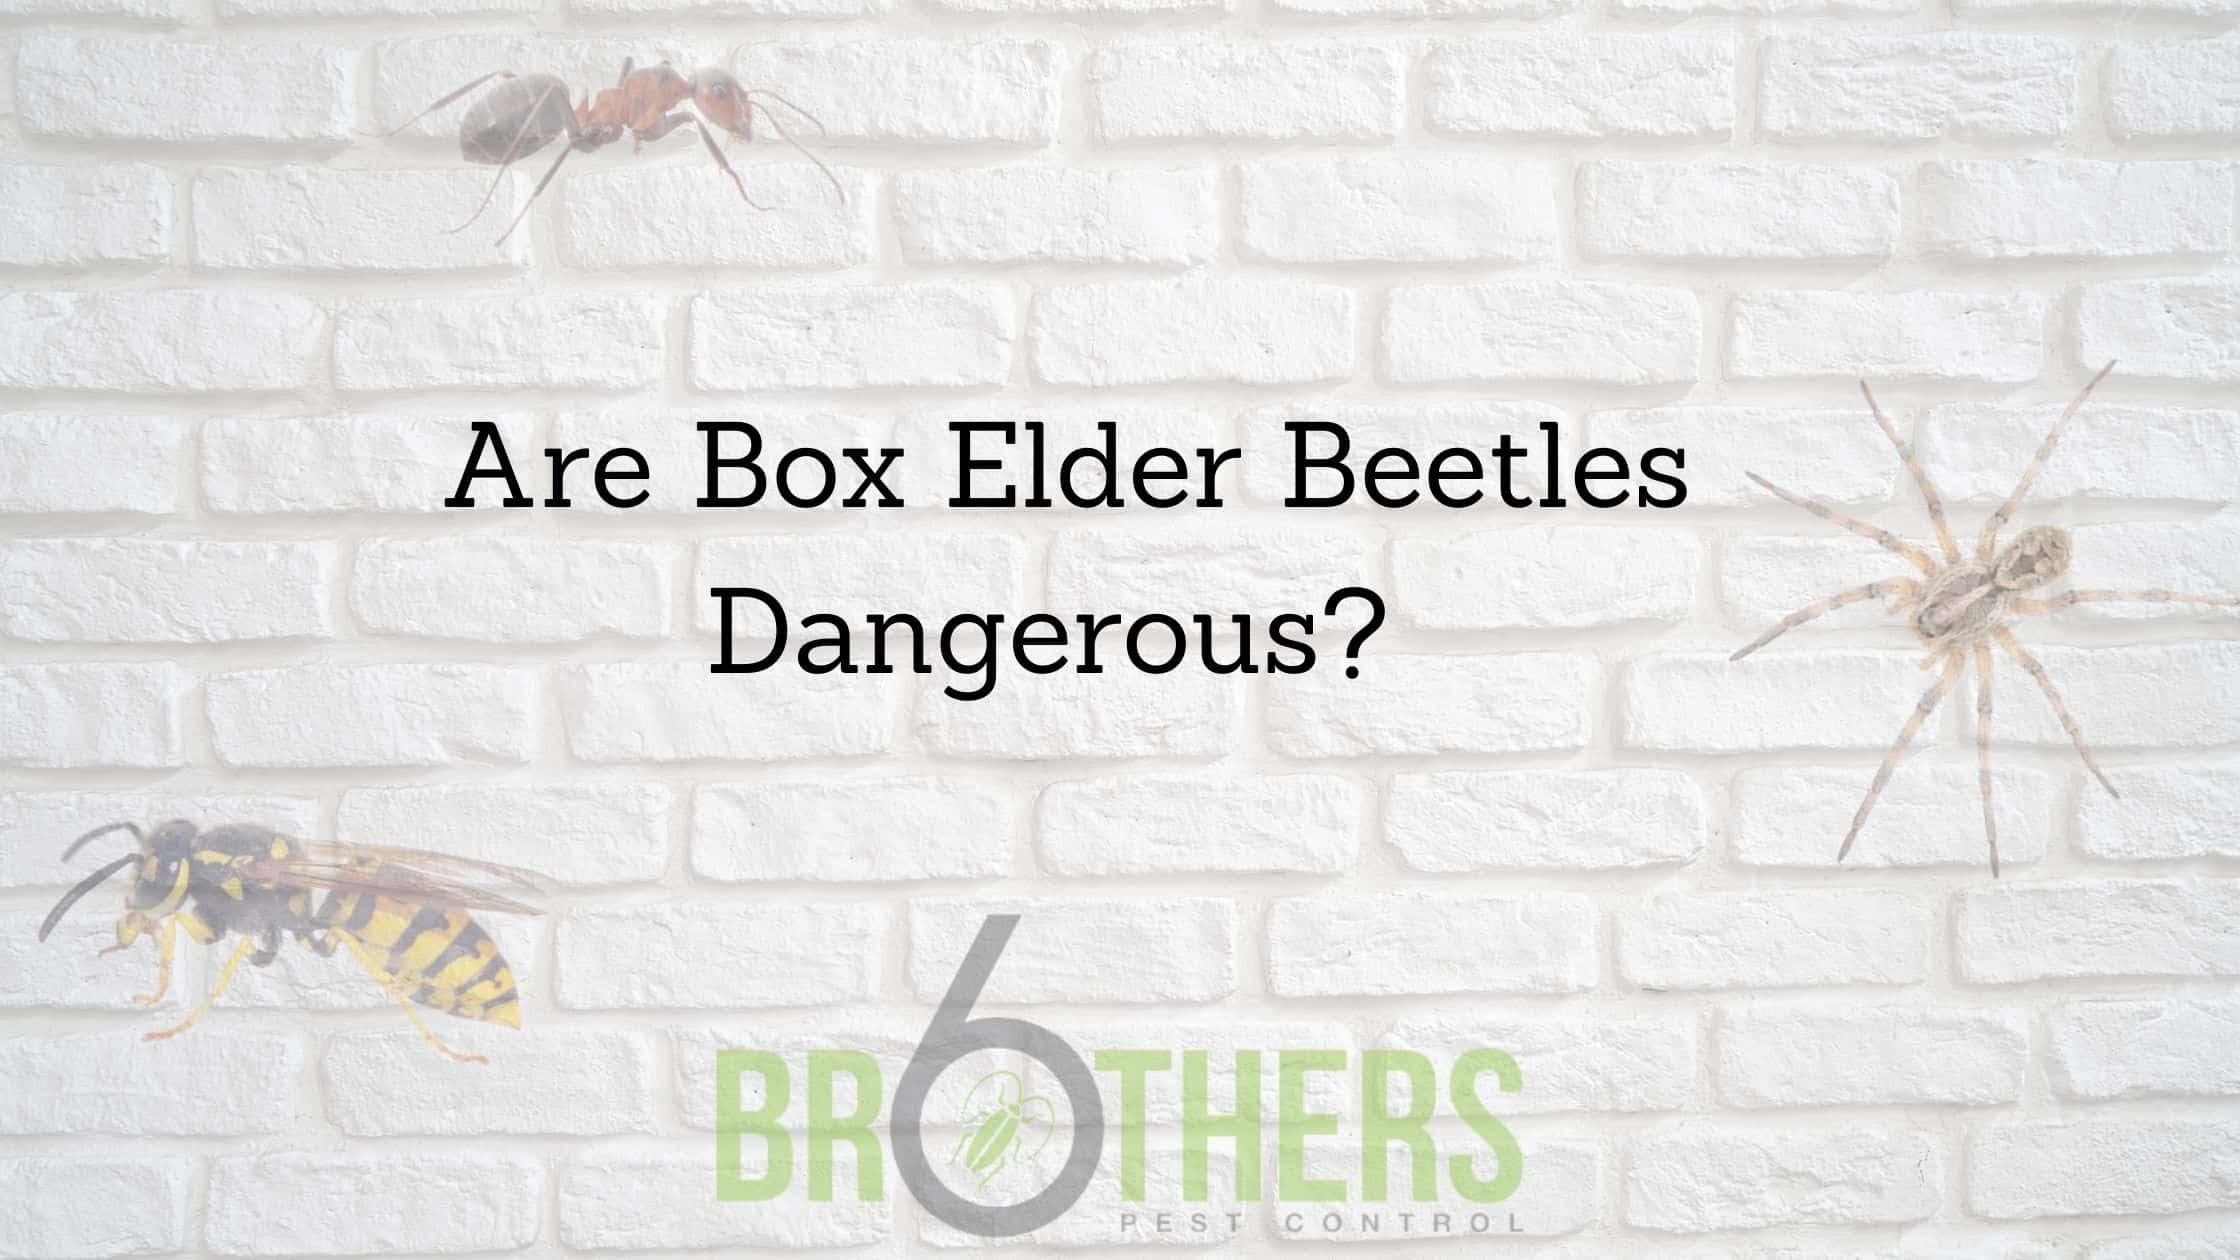 Are Box Elder Beetles Dangerous?